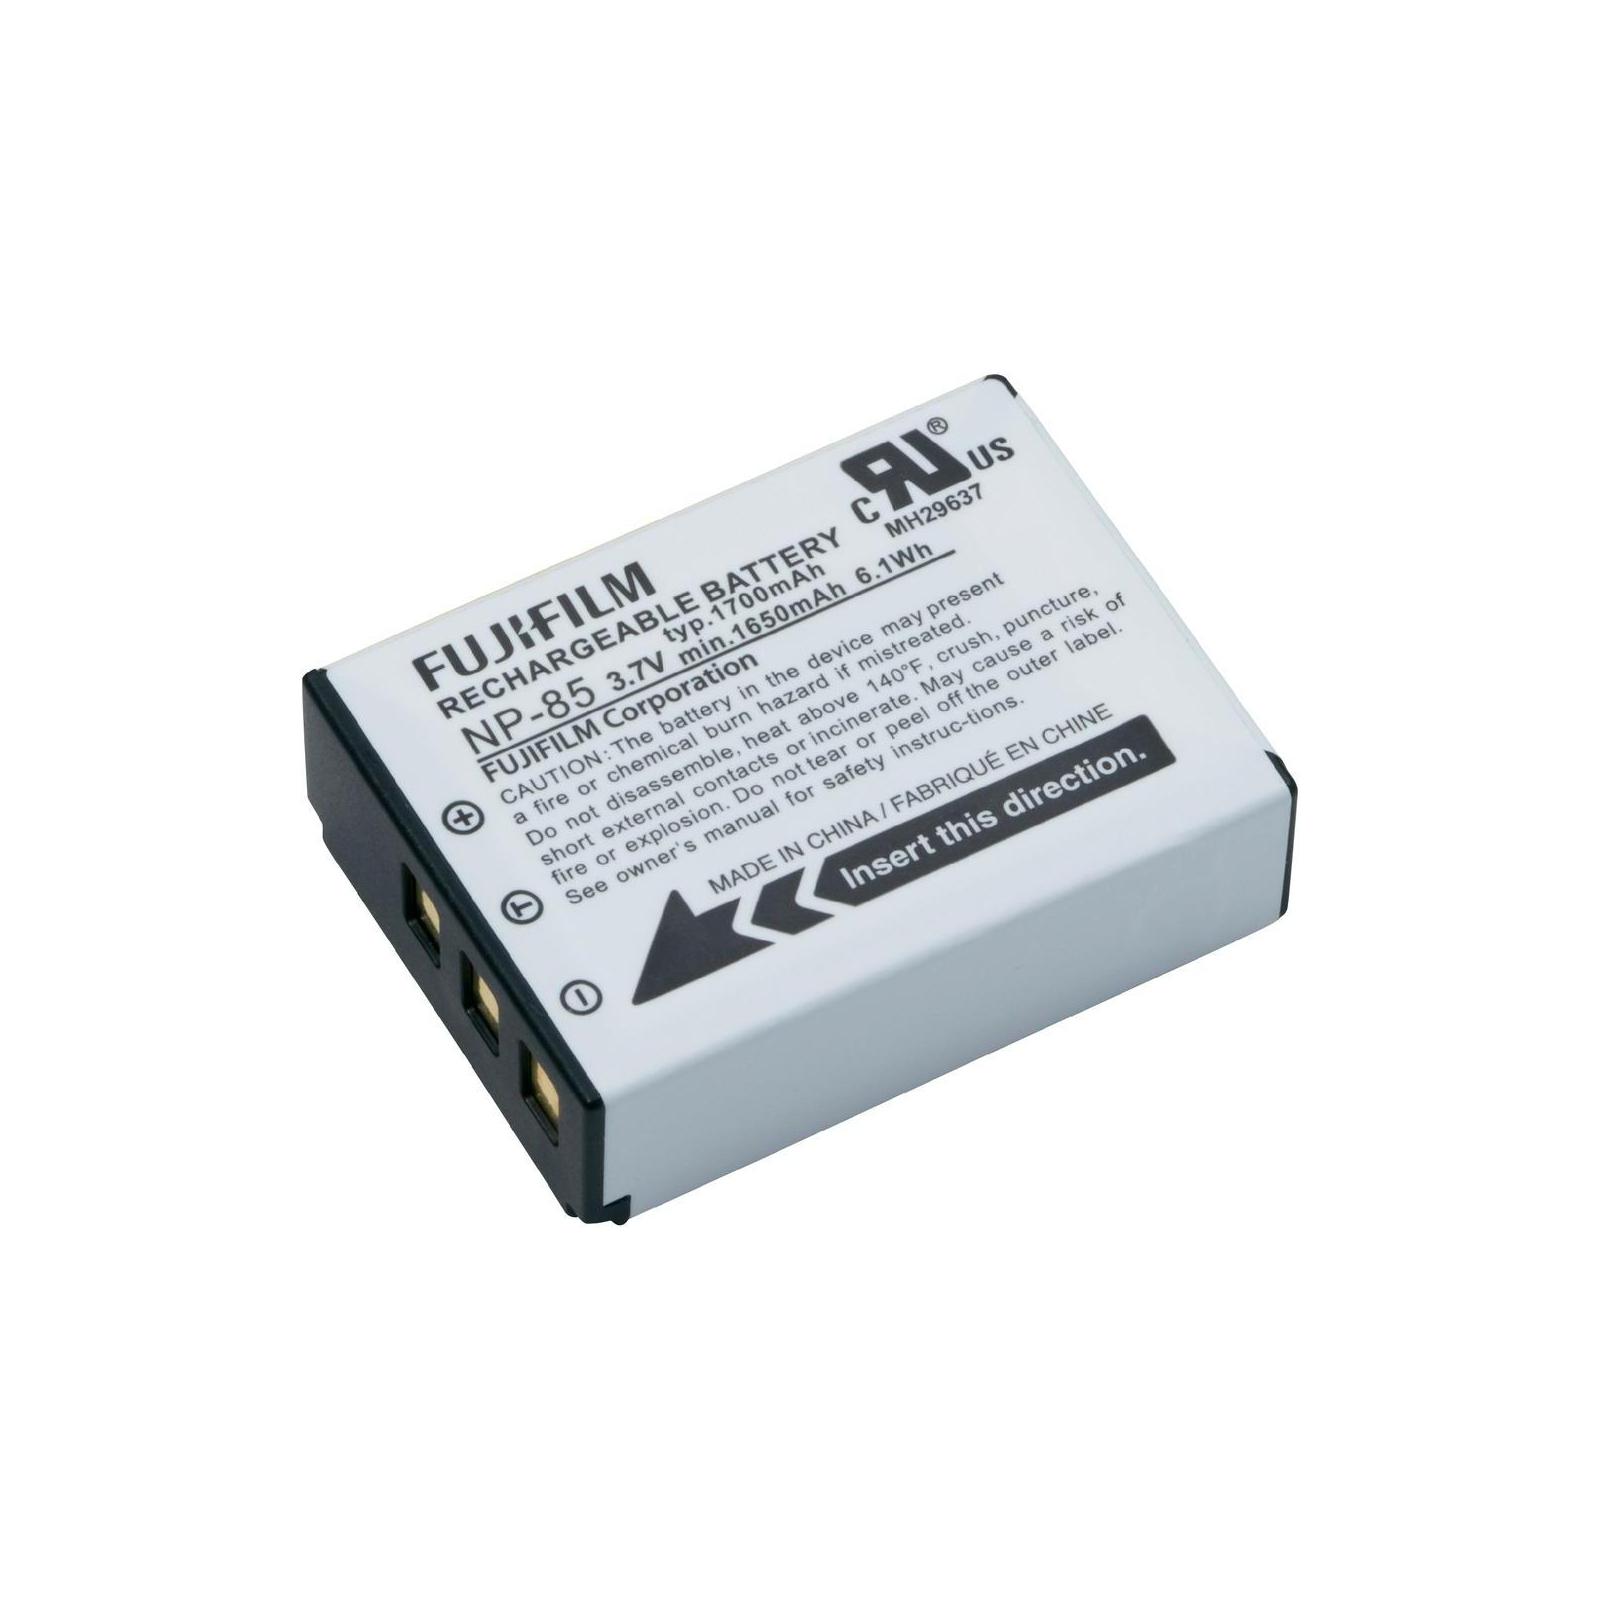 Аккумулятор к фото/видео Fujifilm NP-85-E (16226682)